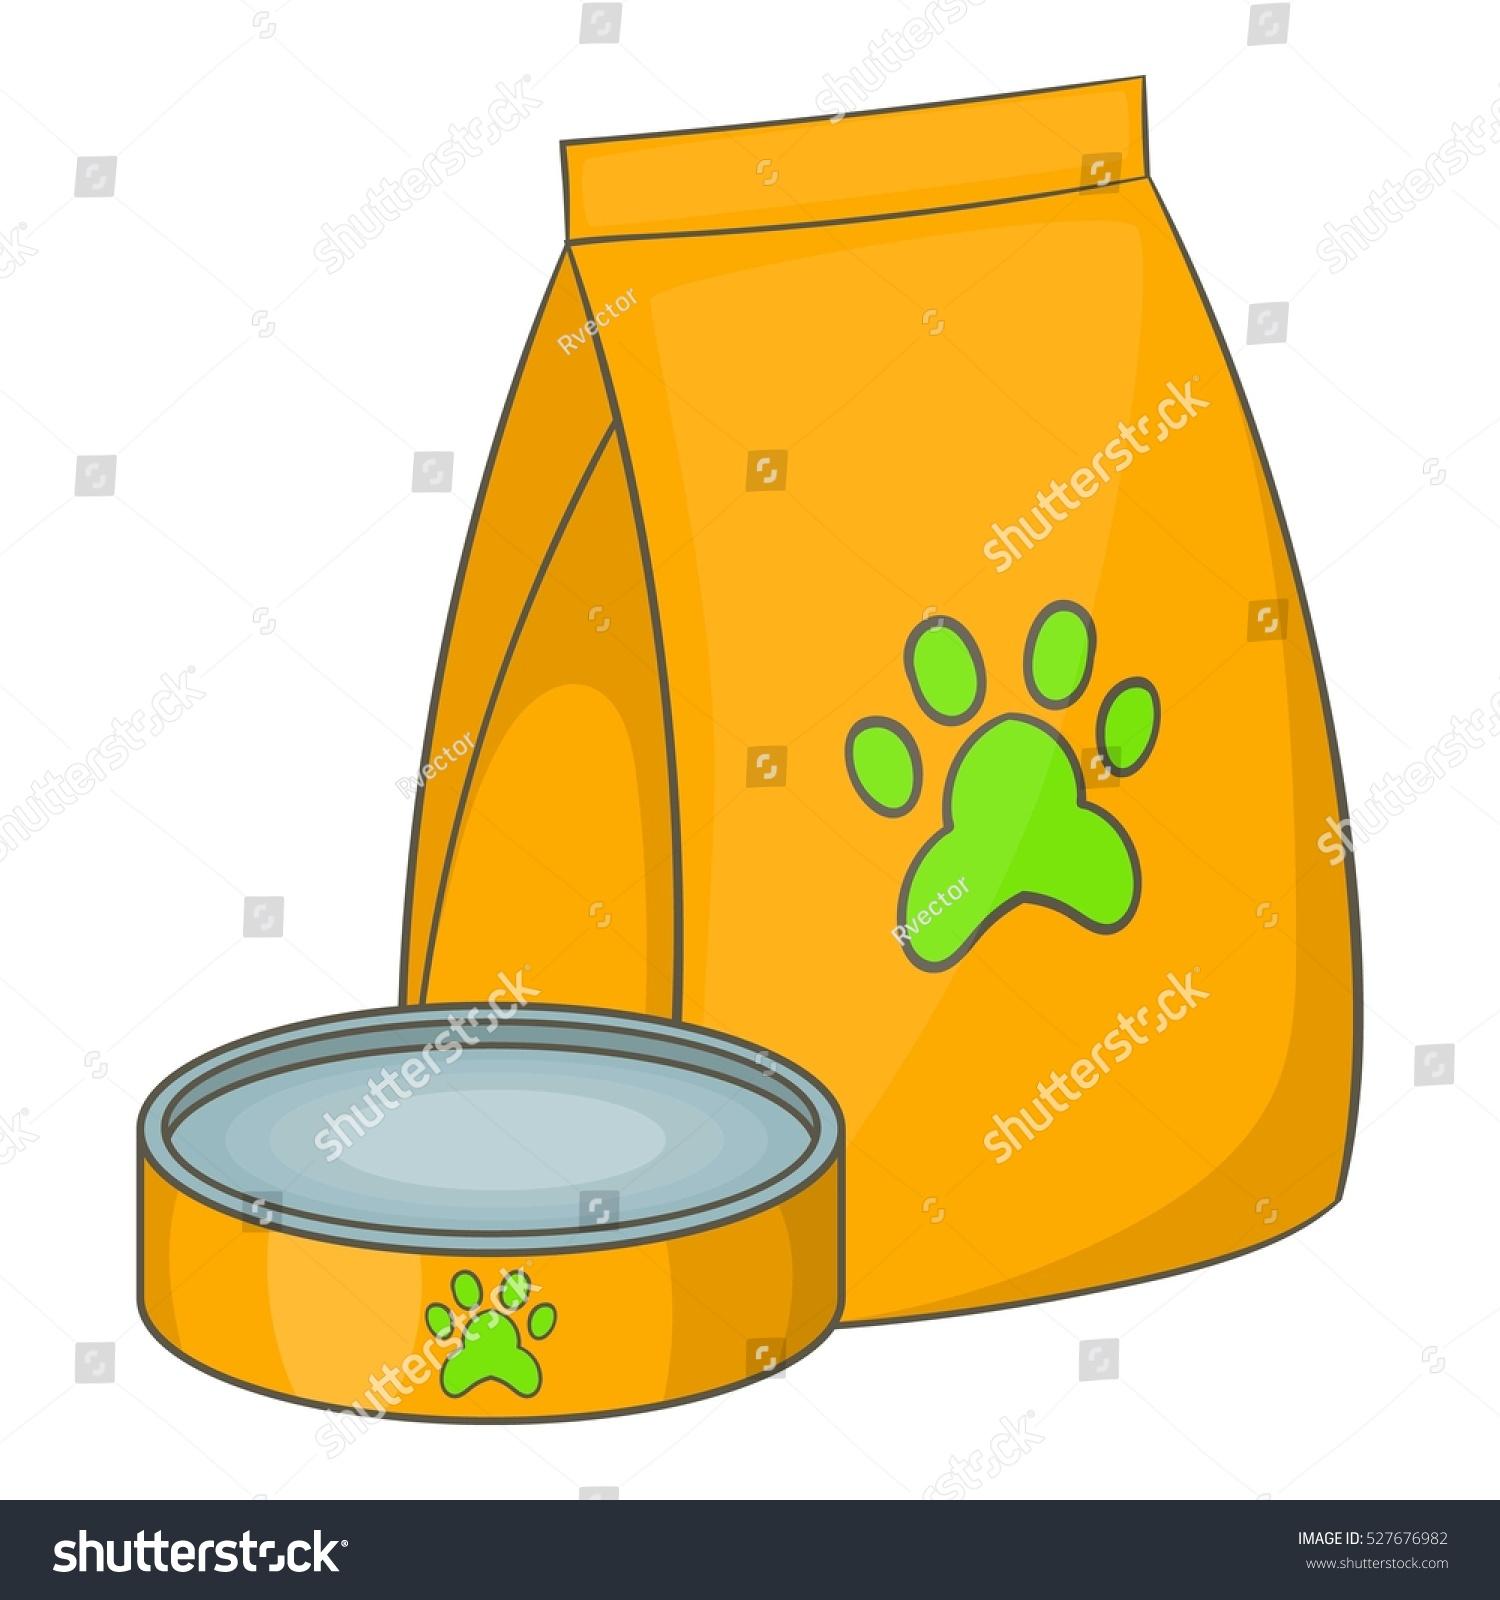 pedigree canned dog food